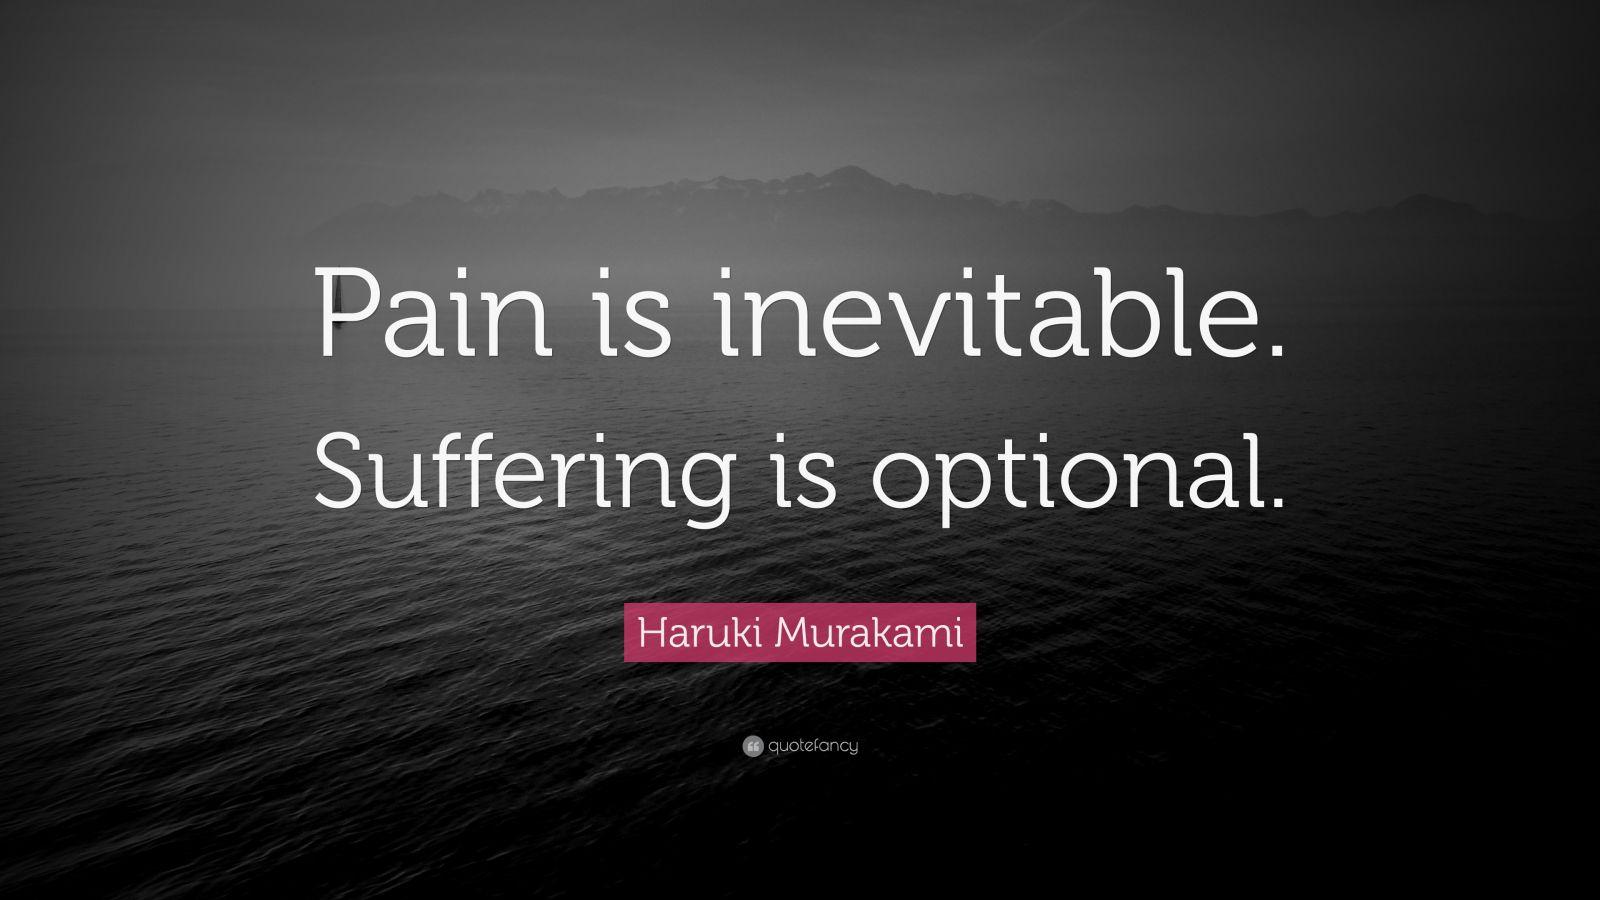 Wallpapers Philosophy Quotes Haruki Murakami Quote Pain Is Inevitable Suffering Is